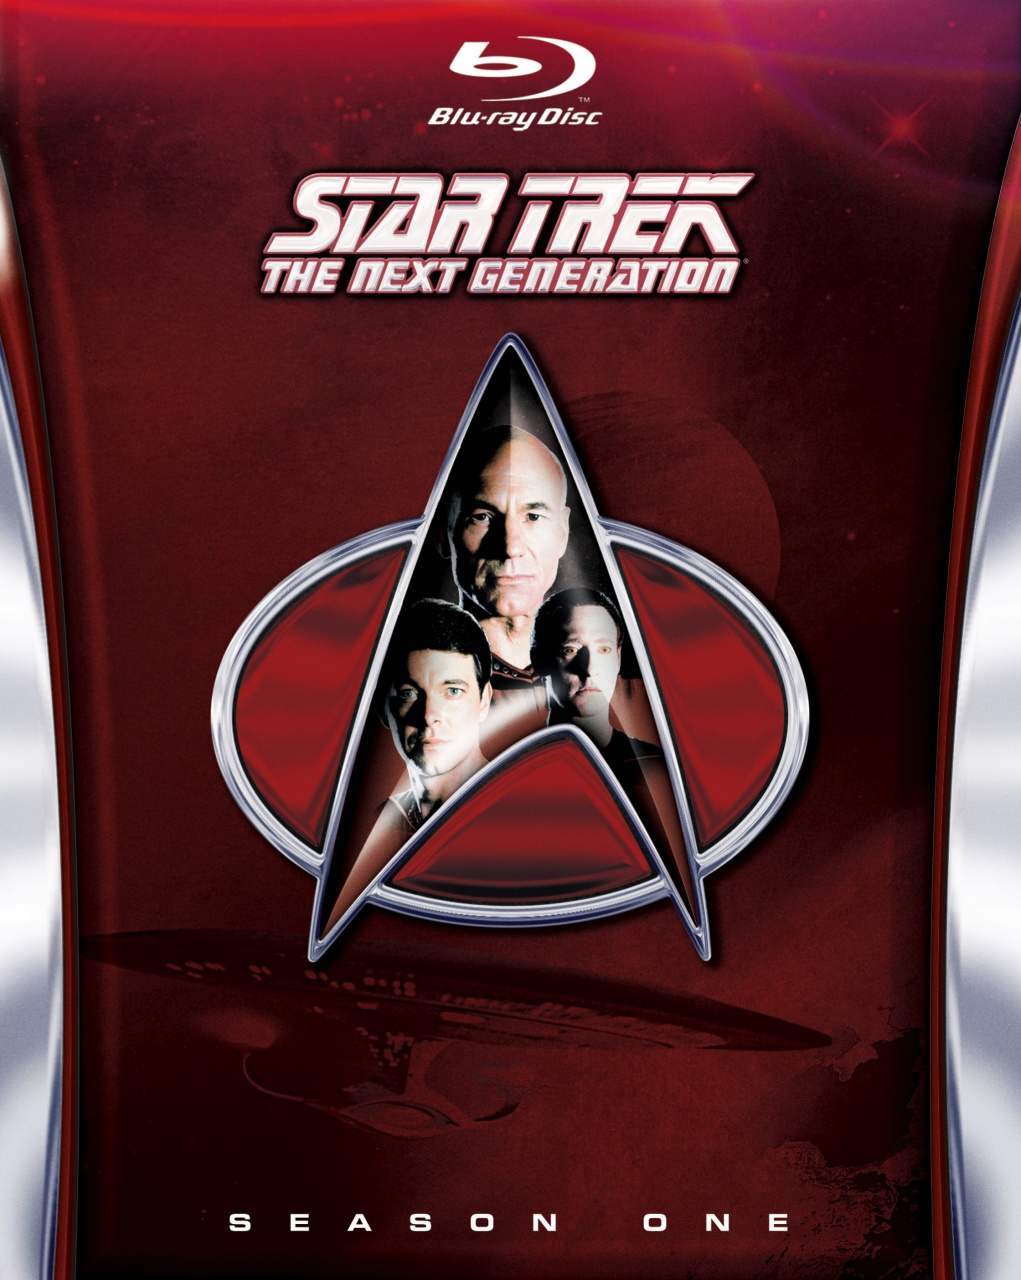 Stardate Revisited: The Origin of Star Trek - The Next Generation